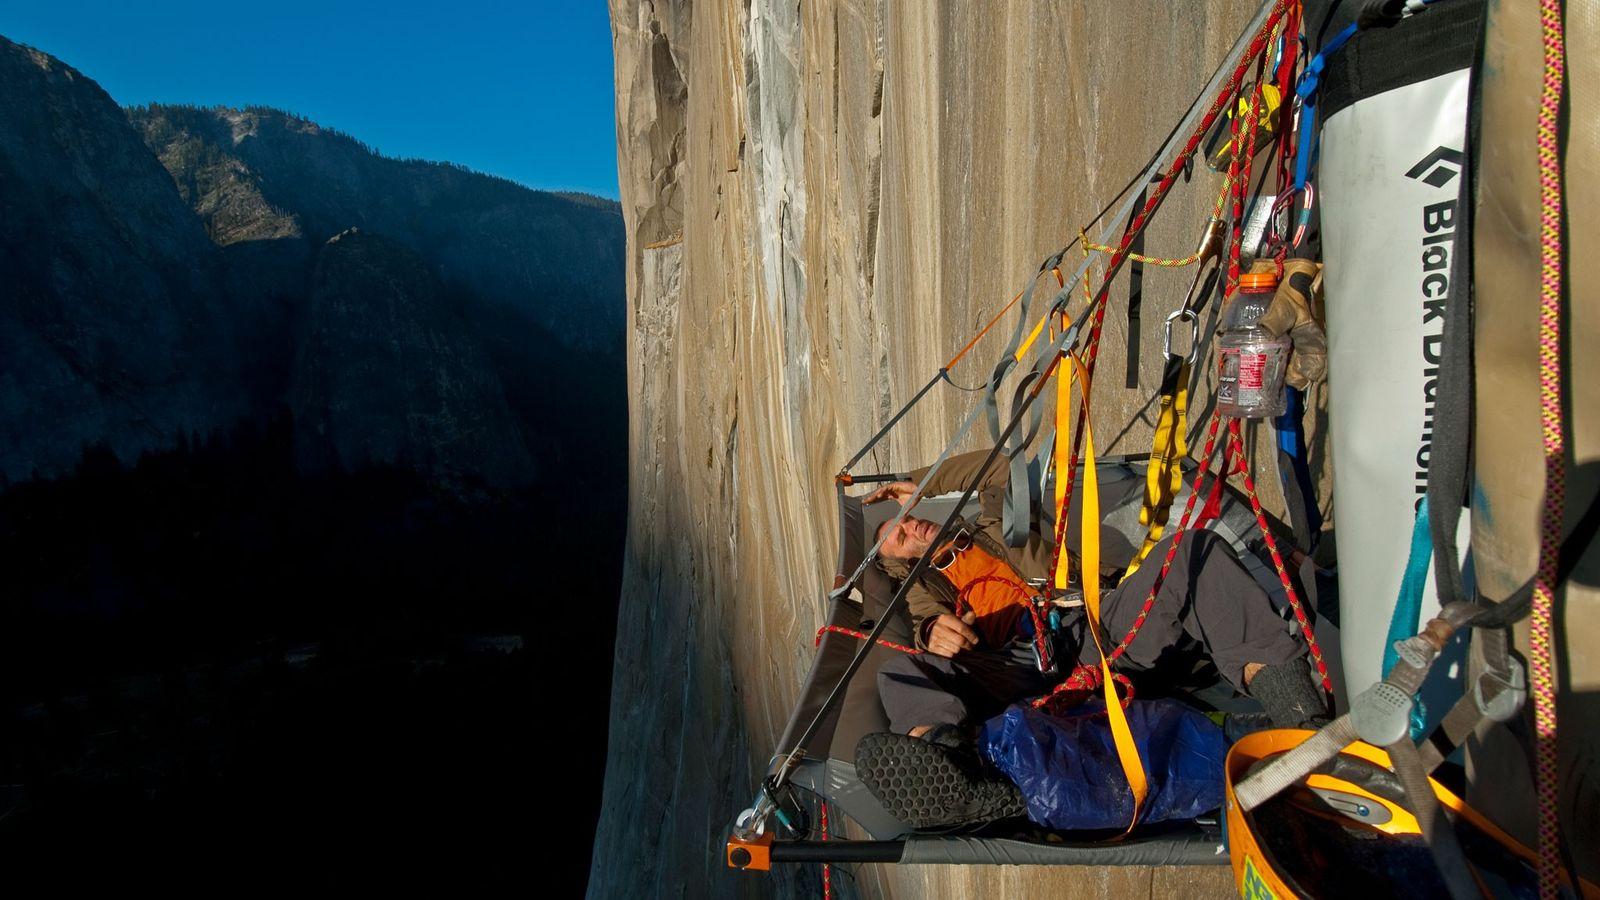 O alpinista Ivo Ninov descansa pendurado na face do El Capitan, no Parque Nacional de Yosemite.